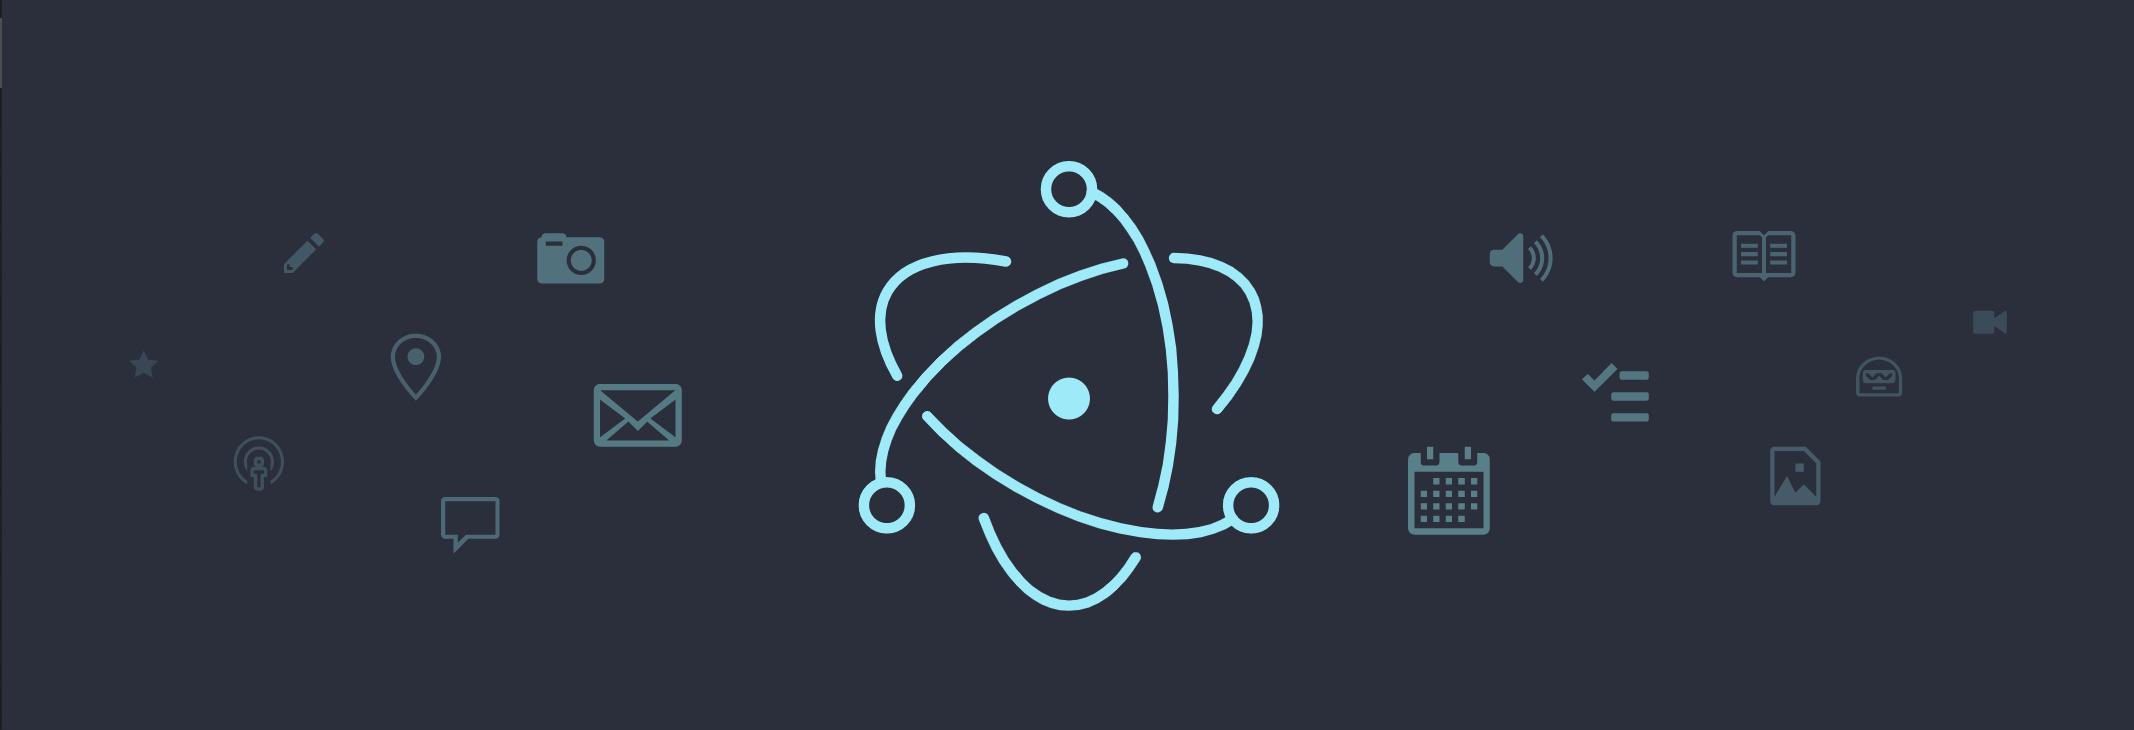 Electron 设置 -webkit-app-region 后无法响应鼠标点击事件的解决方式